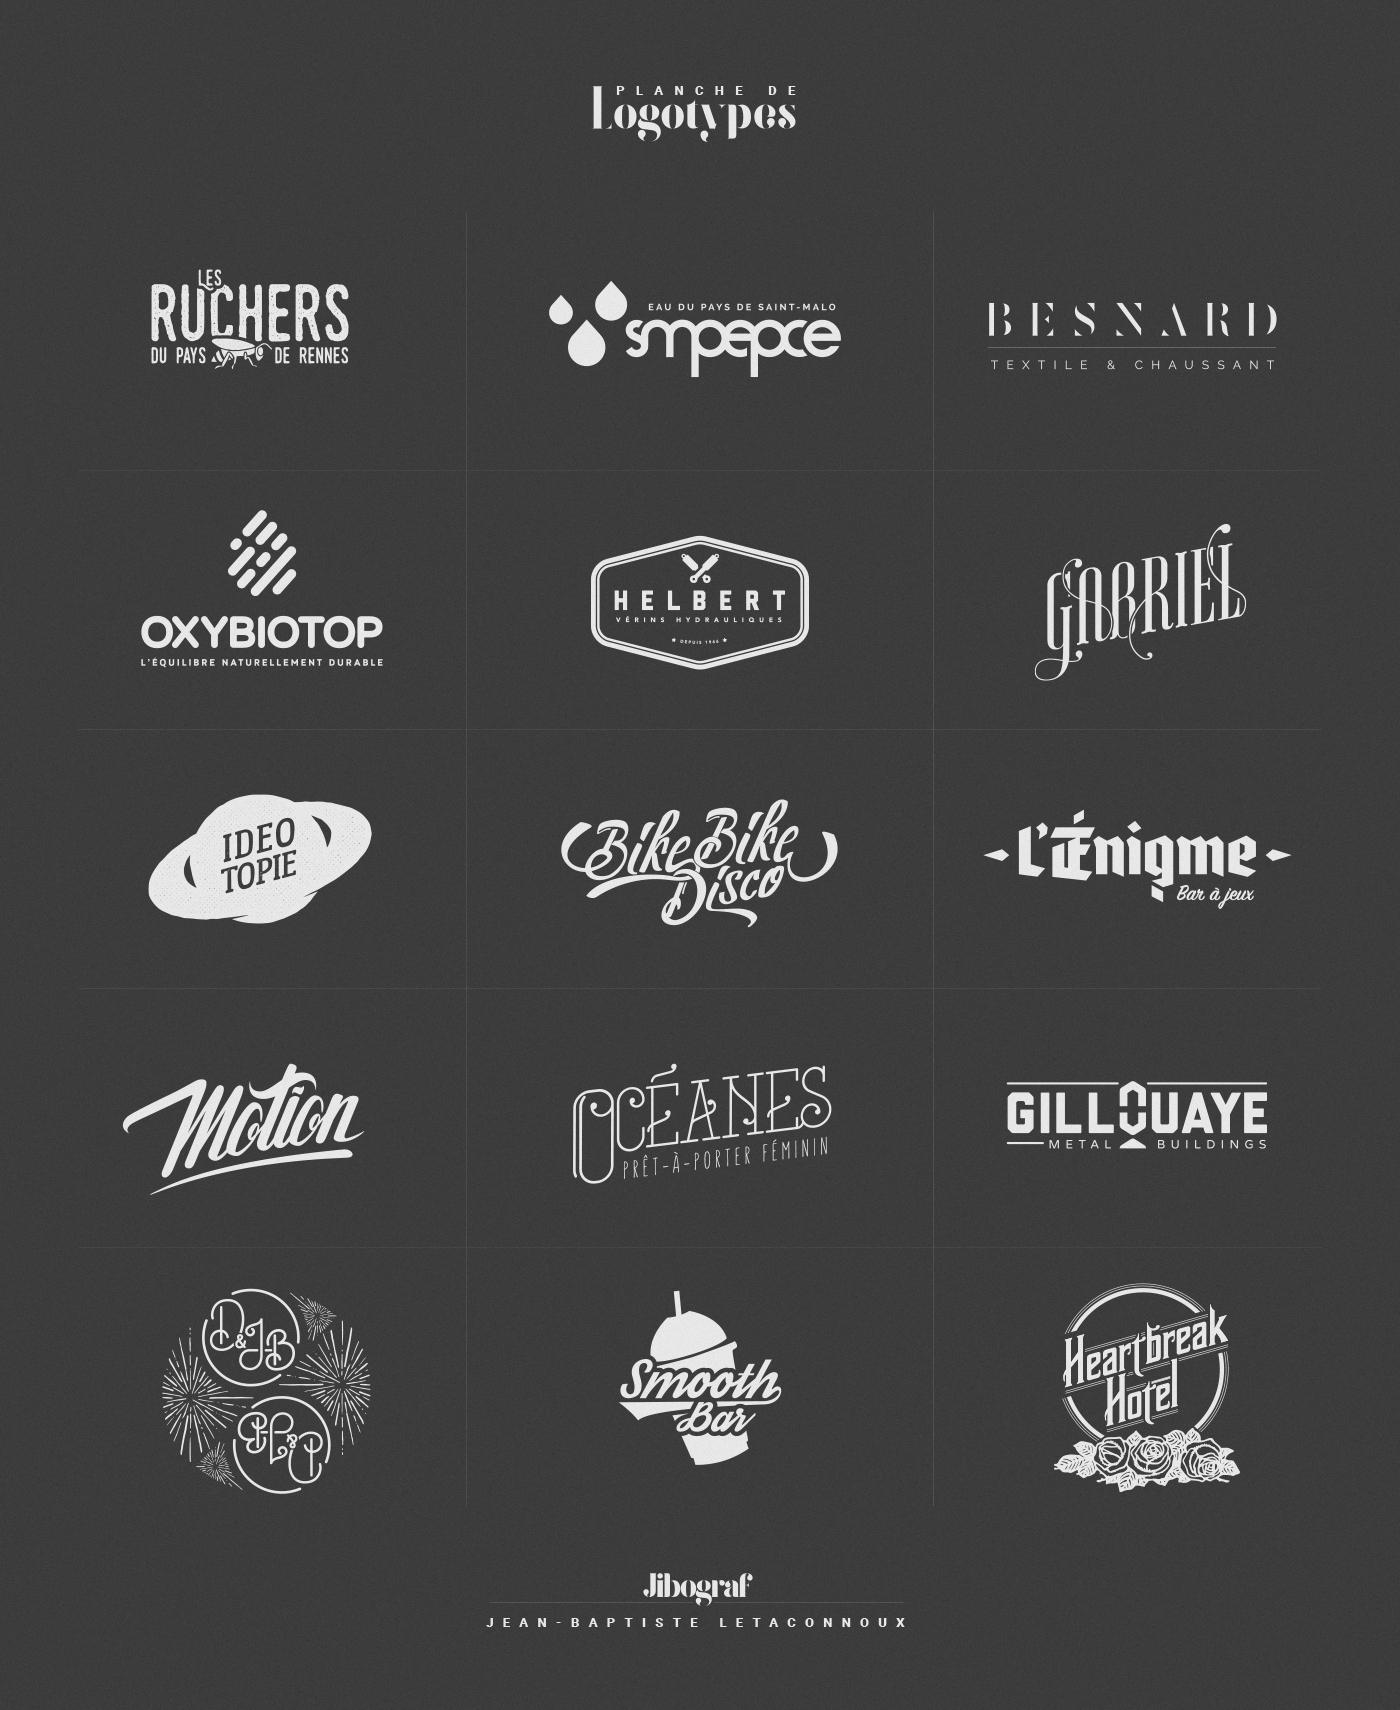 logo Logotype monochrome identité visuelle Visuel identity logodesign design